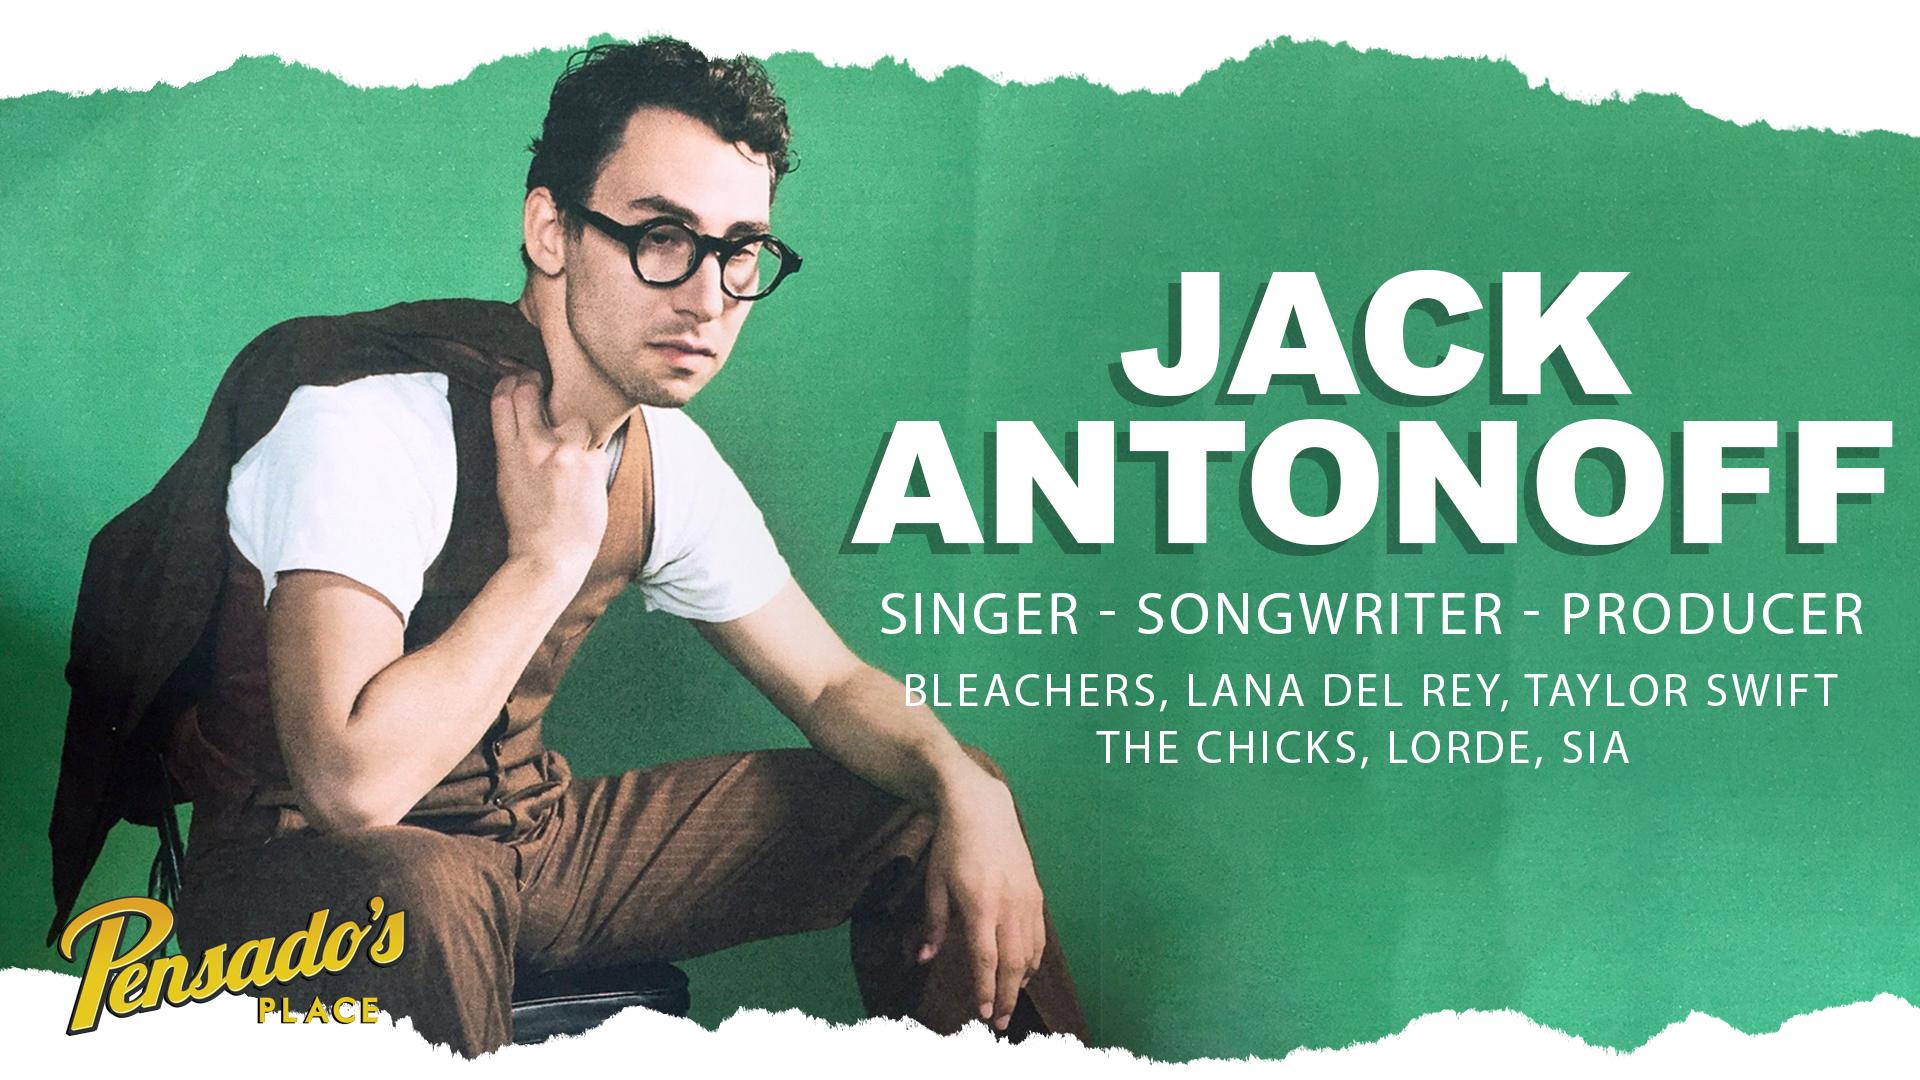 Singer / Songwriter / Producer, Jack Antonoff